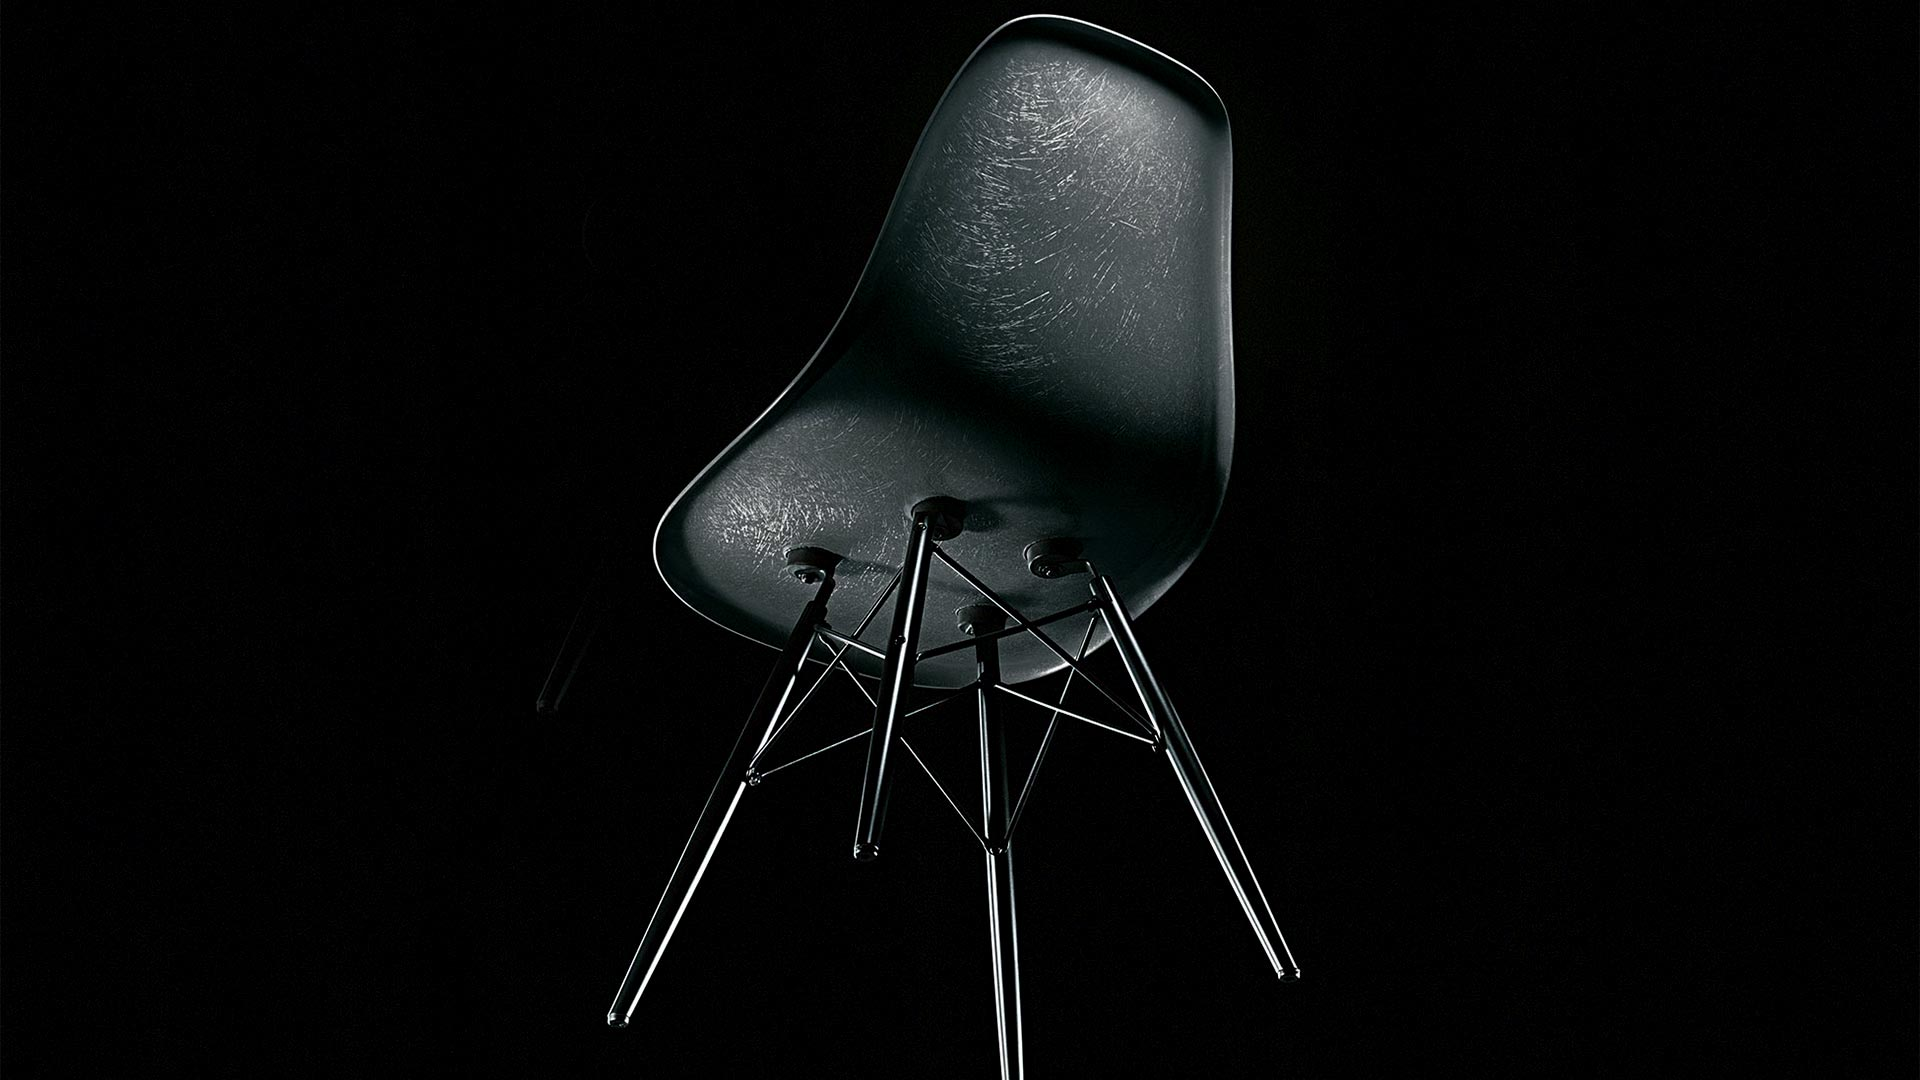 Vitra Eames Fiberglass Chair in Berlin bei steidten+ 12